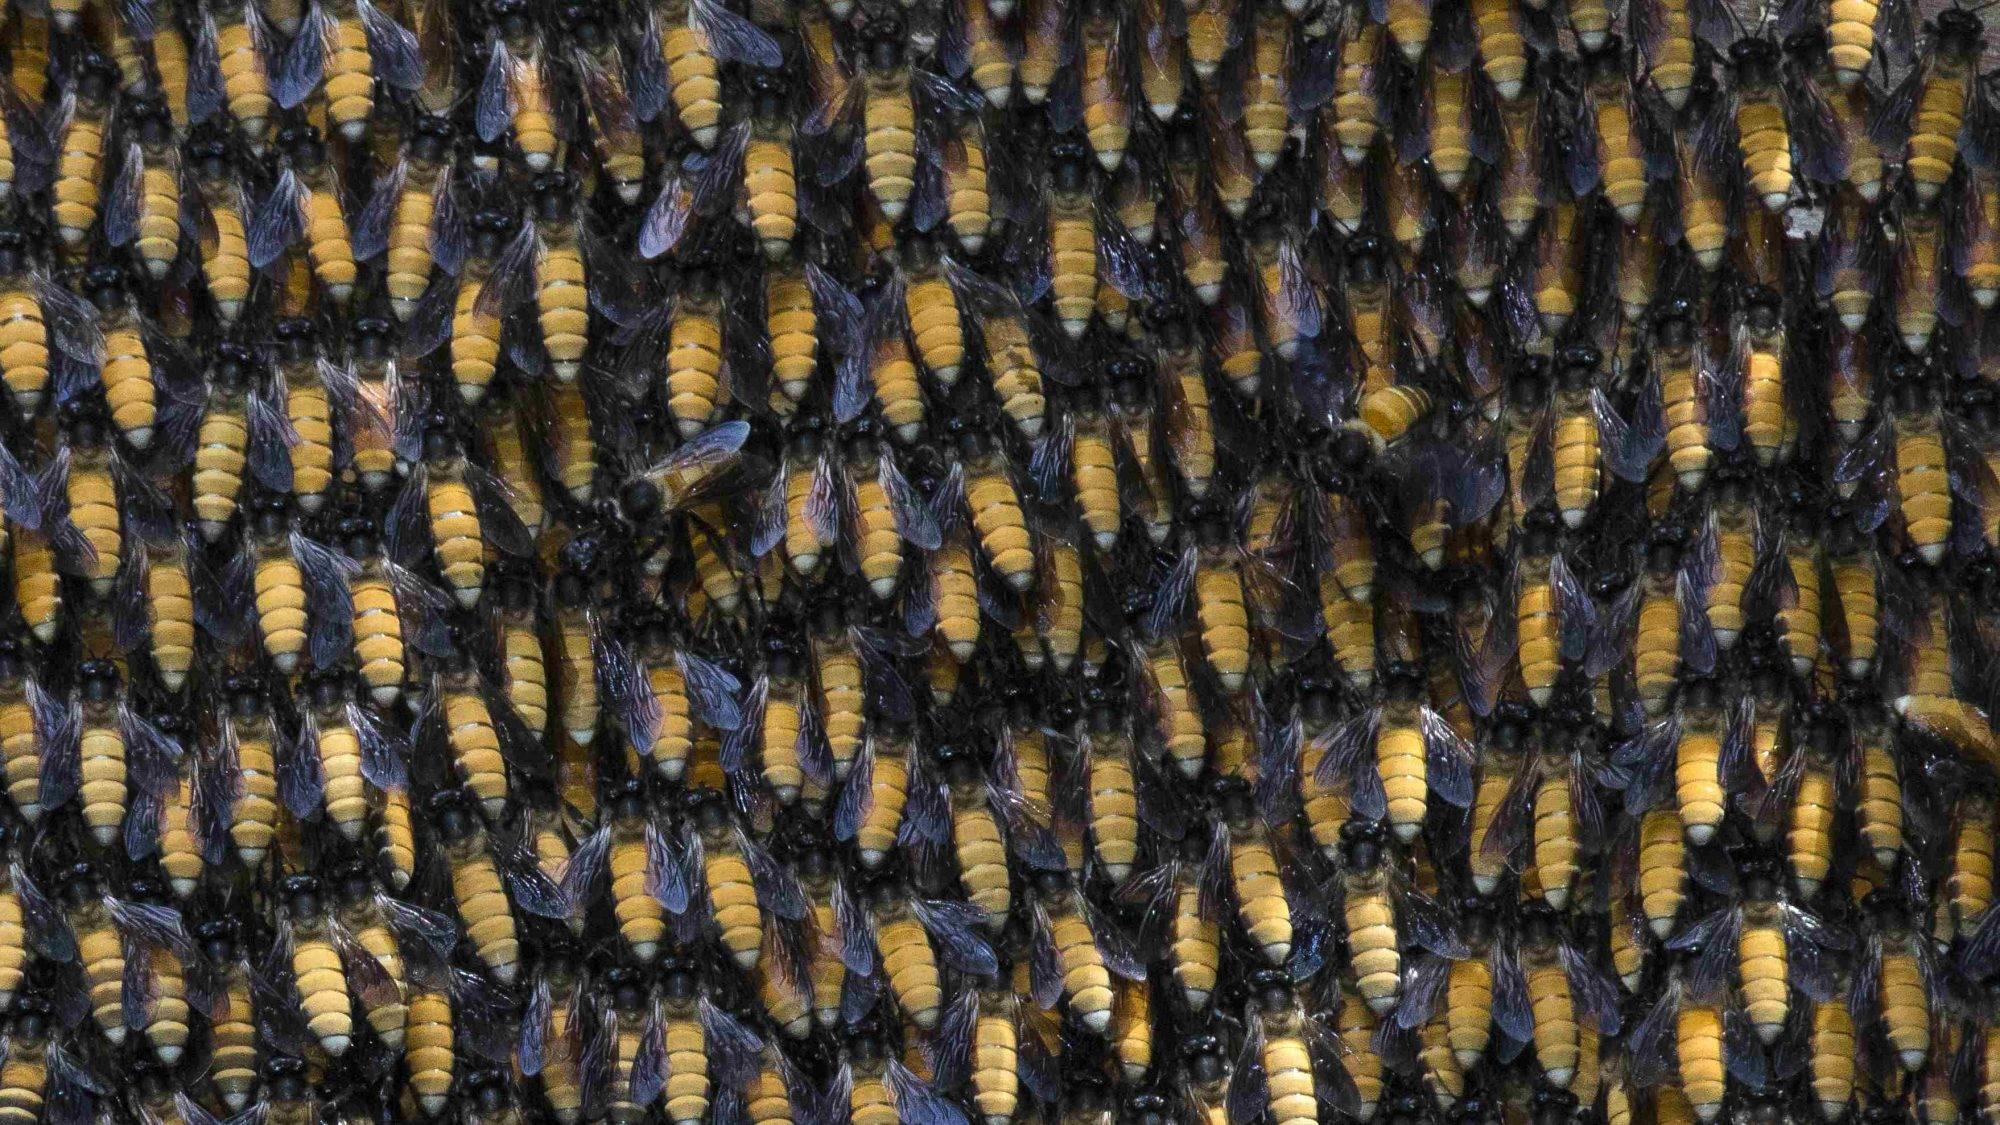 honey bees,andaman bees,mount harriet nature